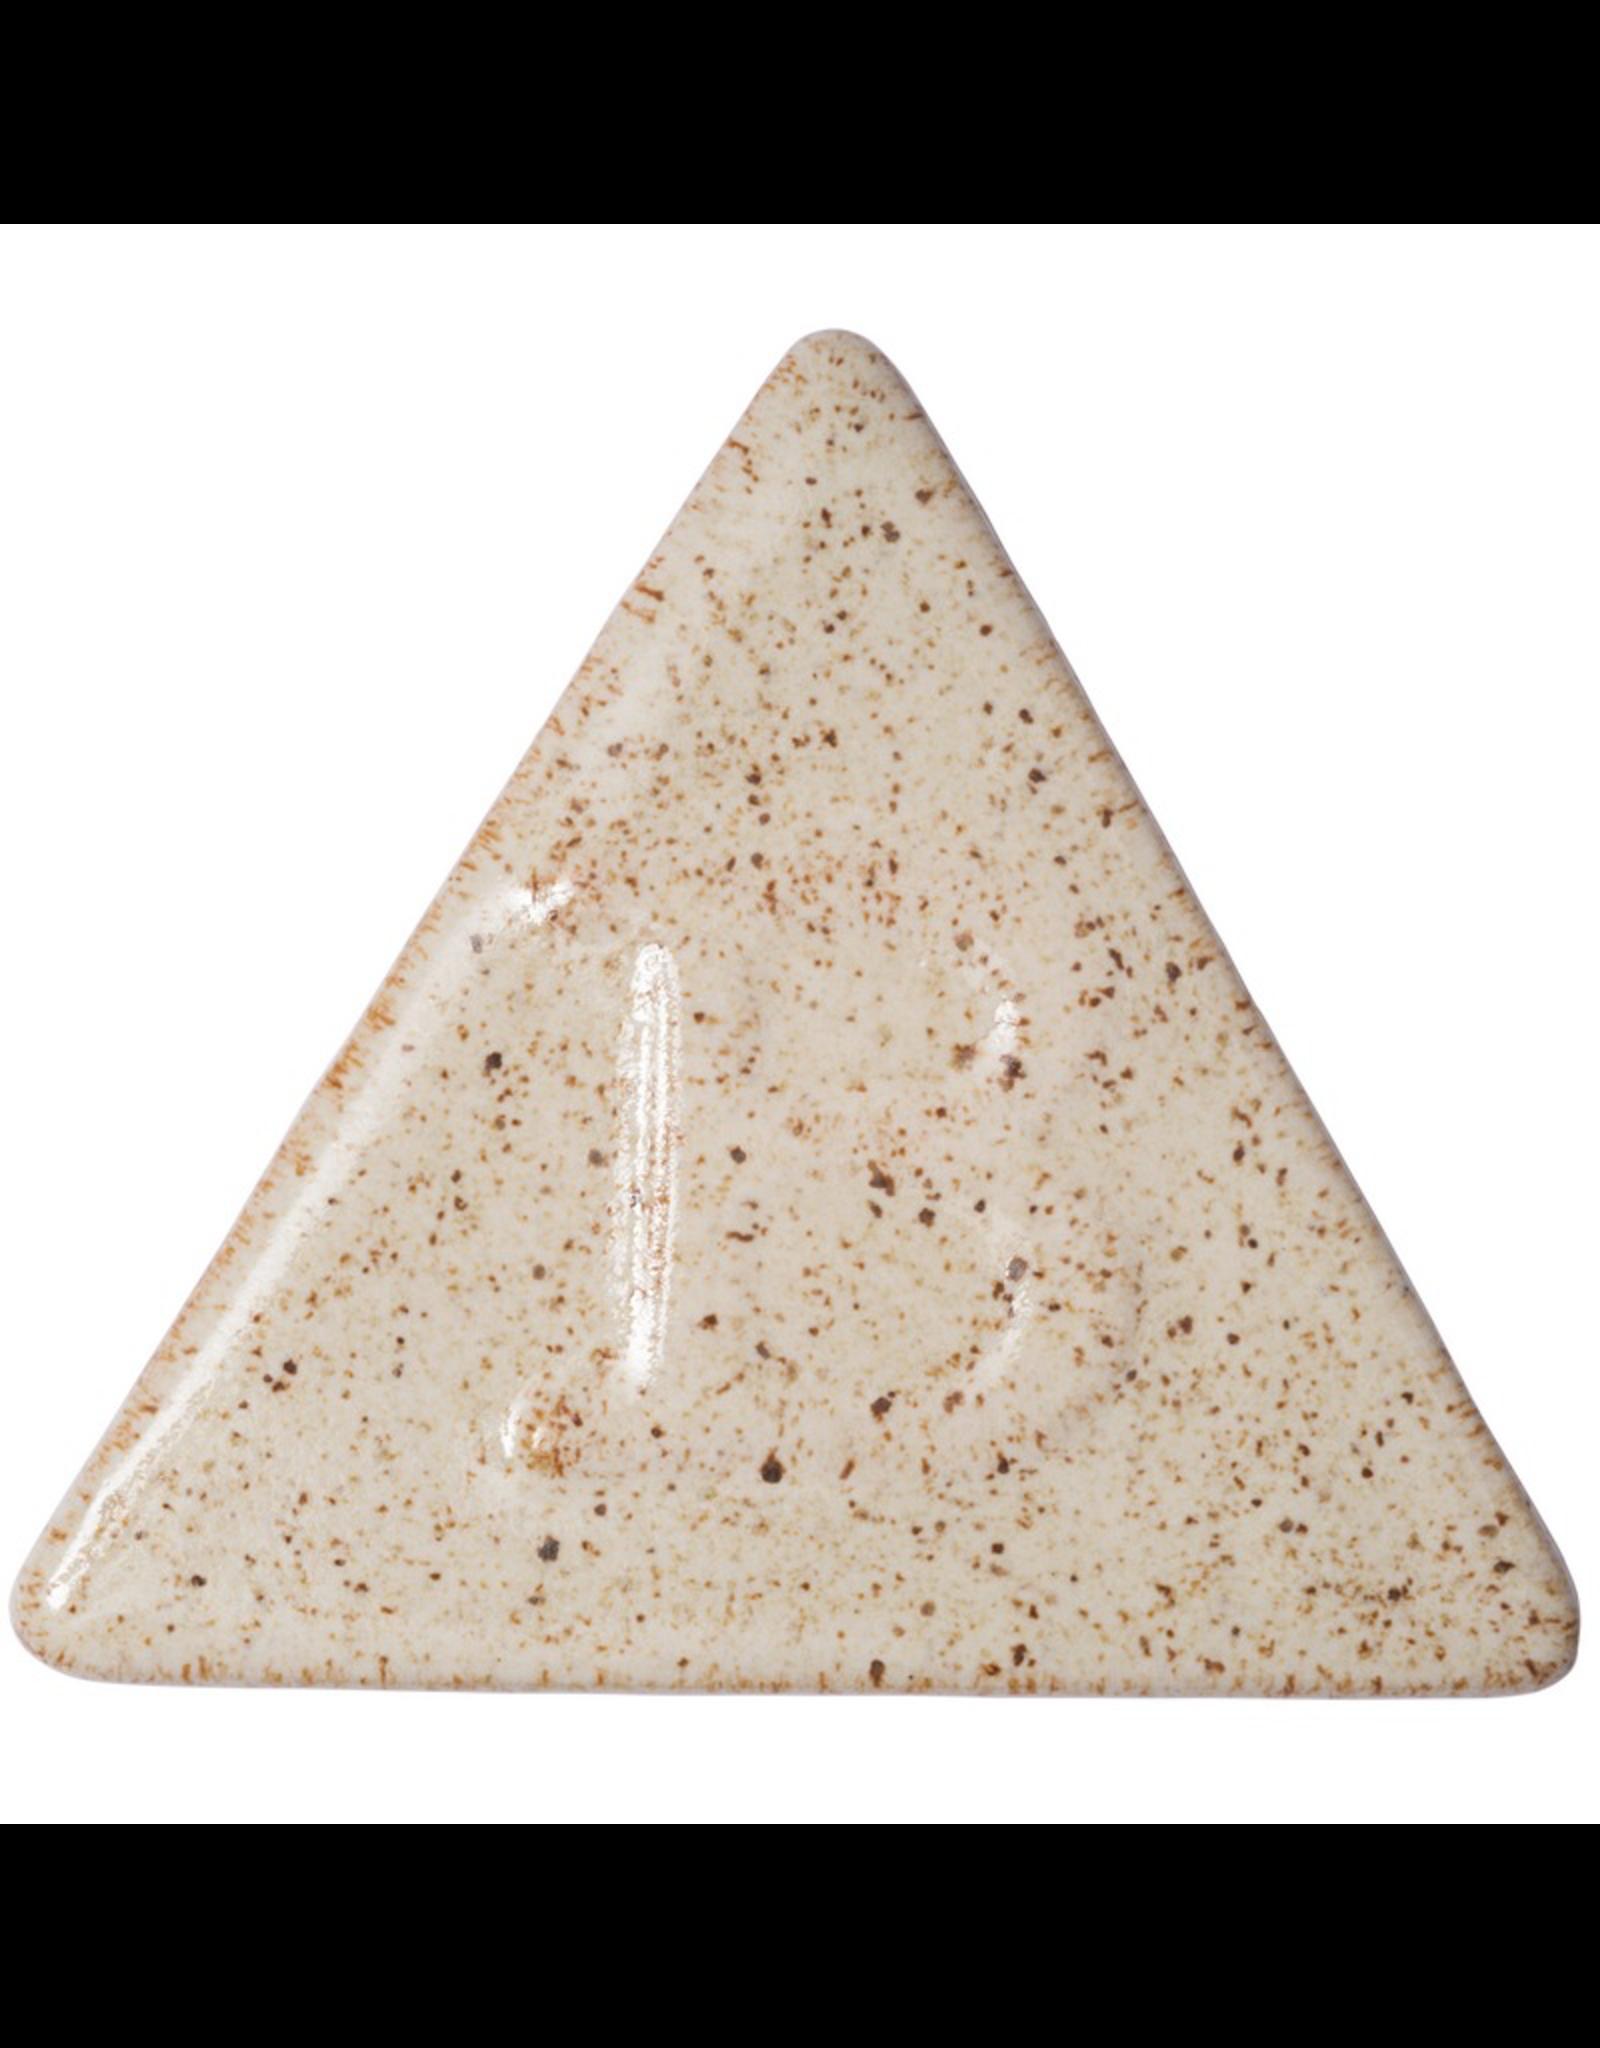 Botz Speckled Cream 800ml